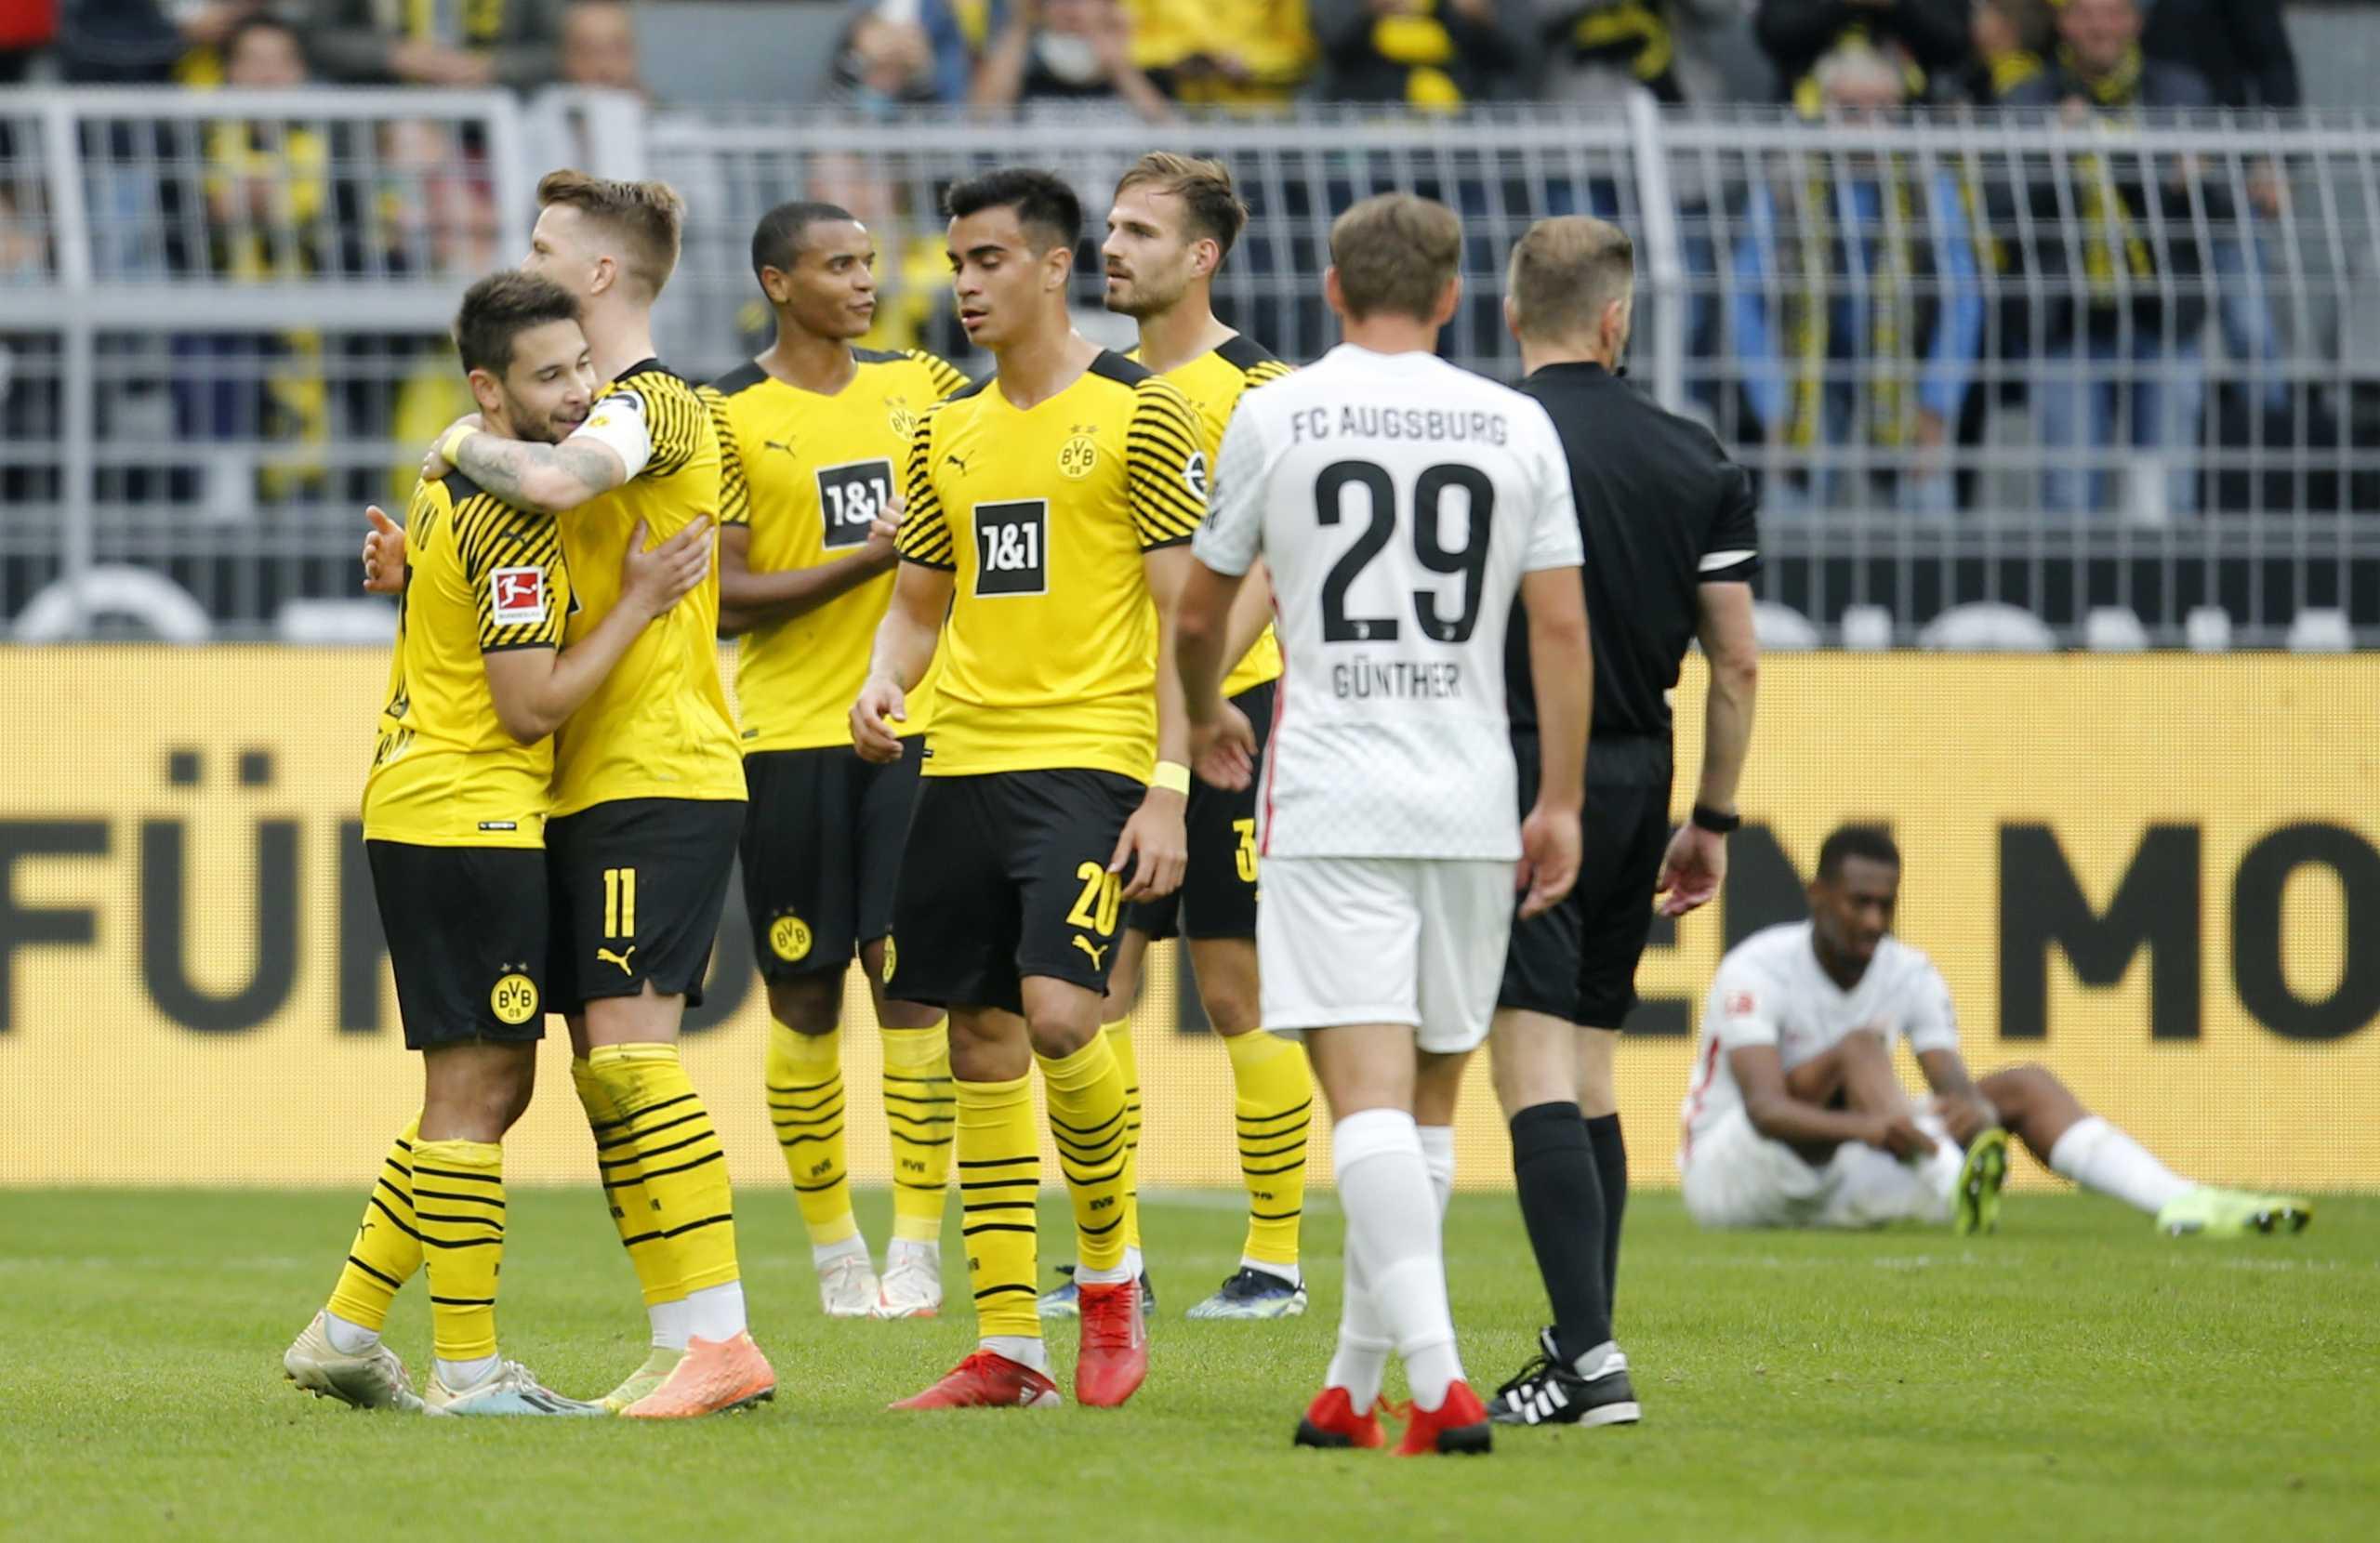 Bundesliga, Ντόρτμουντ – Άουγκσμπουργκ 2-1: Μπορούν και χωρίς Χάαλαντ οι Βεστφαλοί